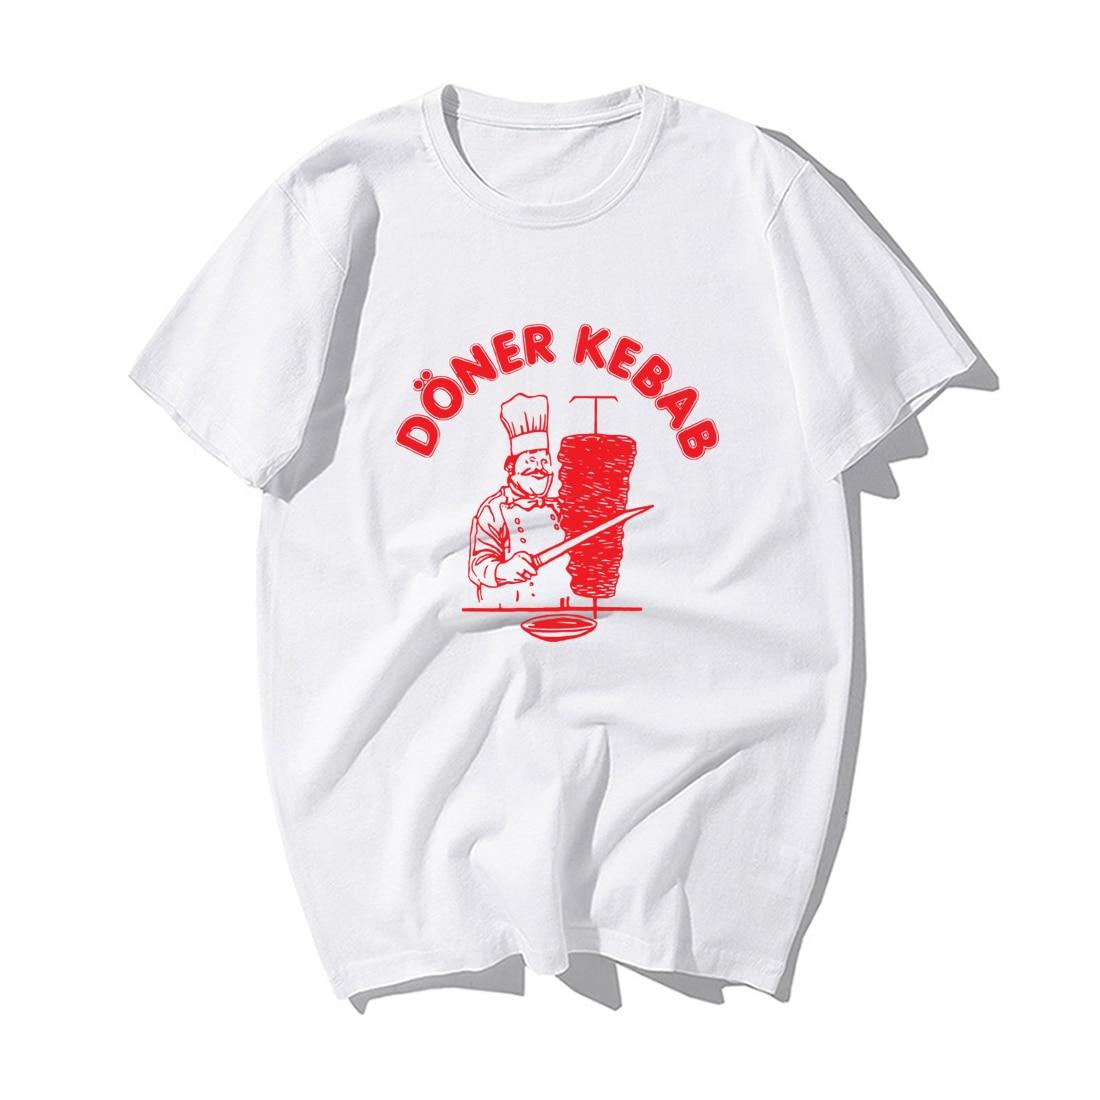 Newest Funny Doner Kebab Donerspie Print Tshirt Summer Cotton Short Sleeve Tshirts Kebab T-Shirts Men'S Harajuku Streetwear